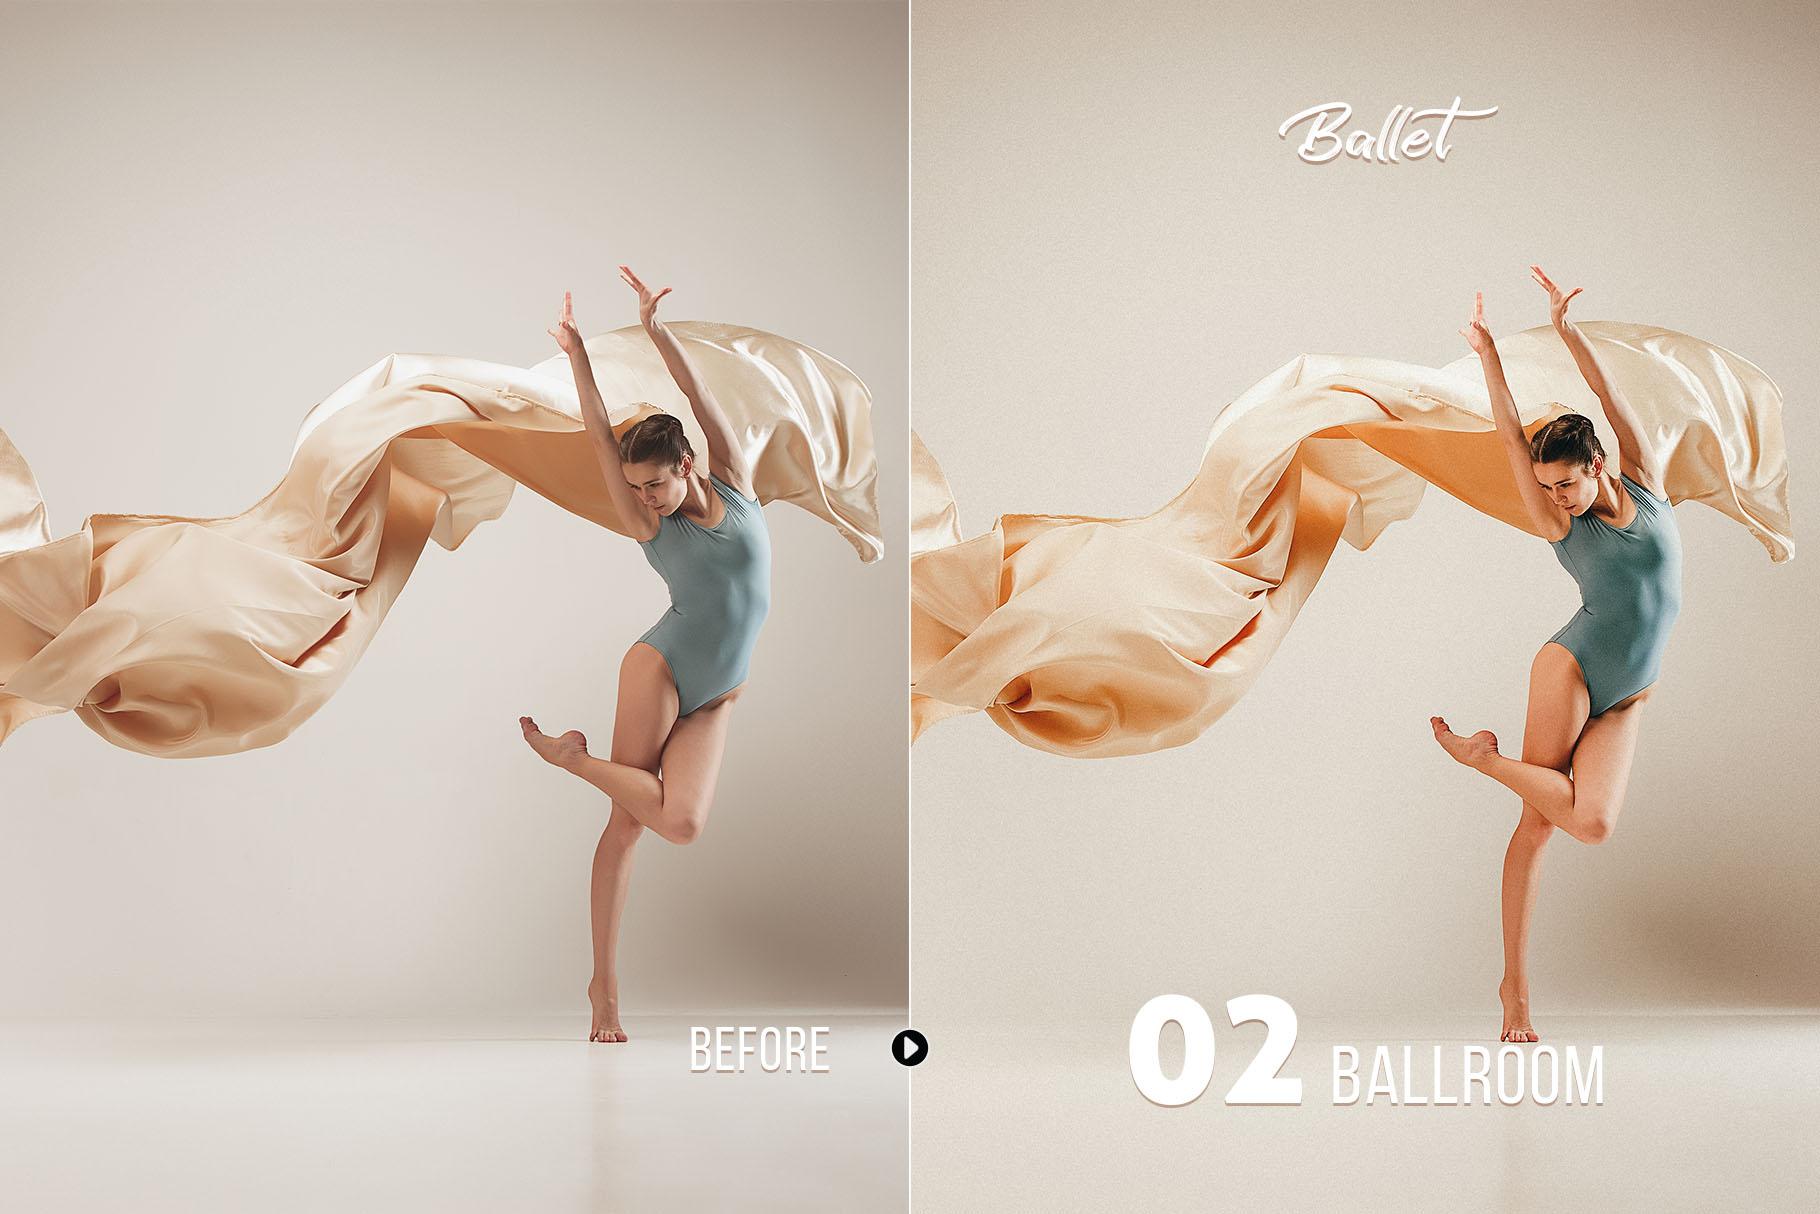 Ballet_preview_02